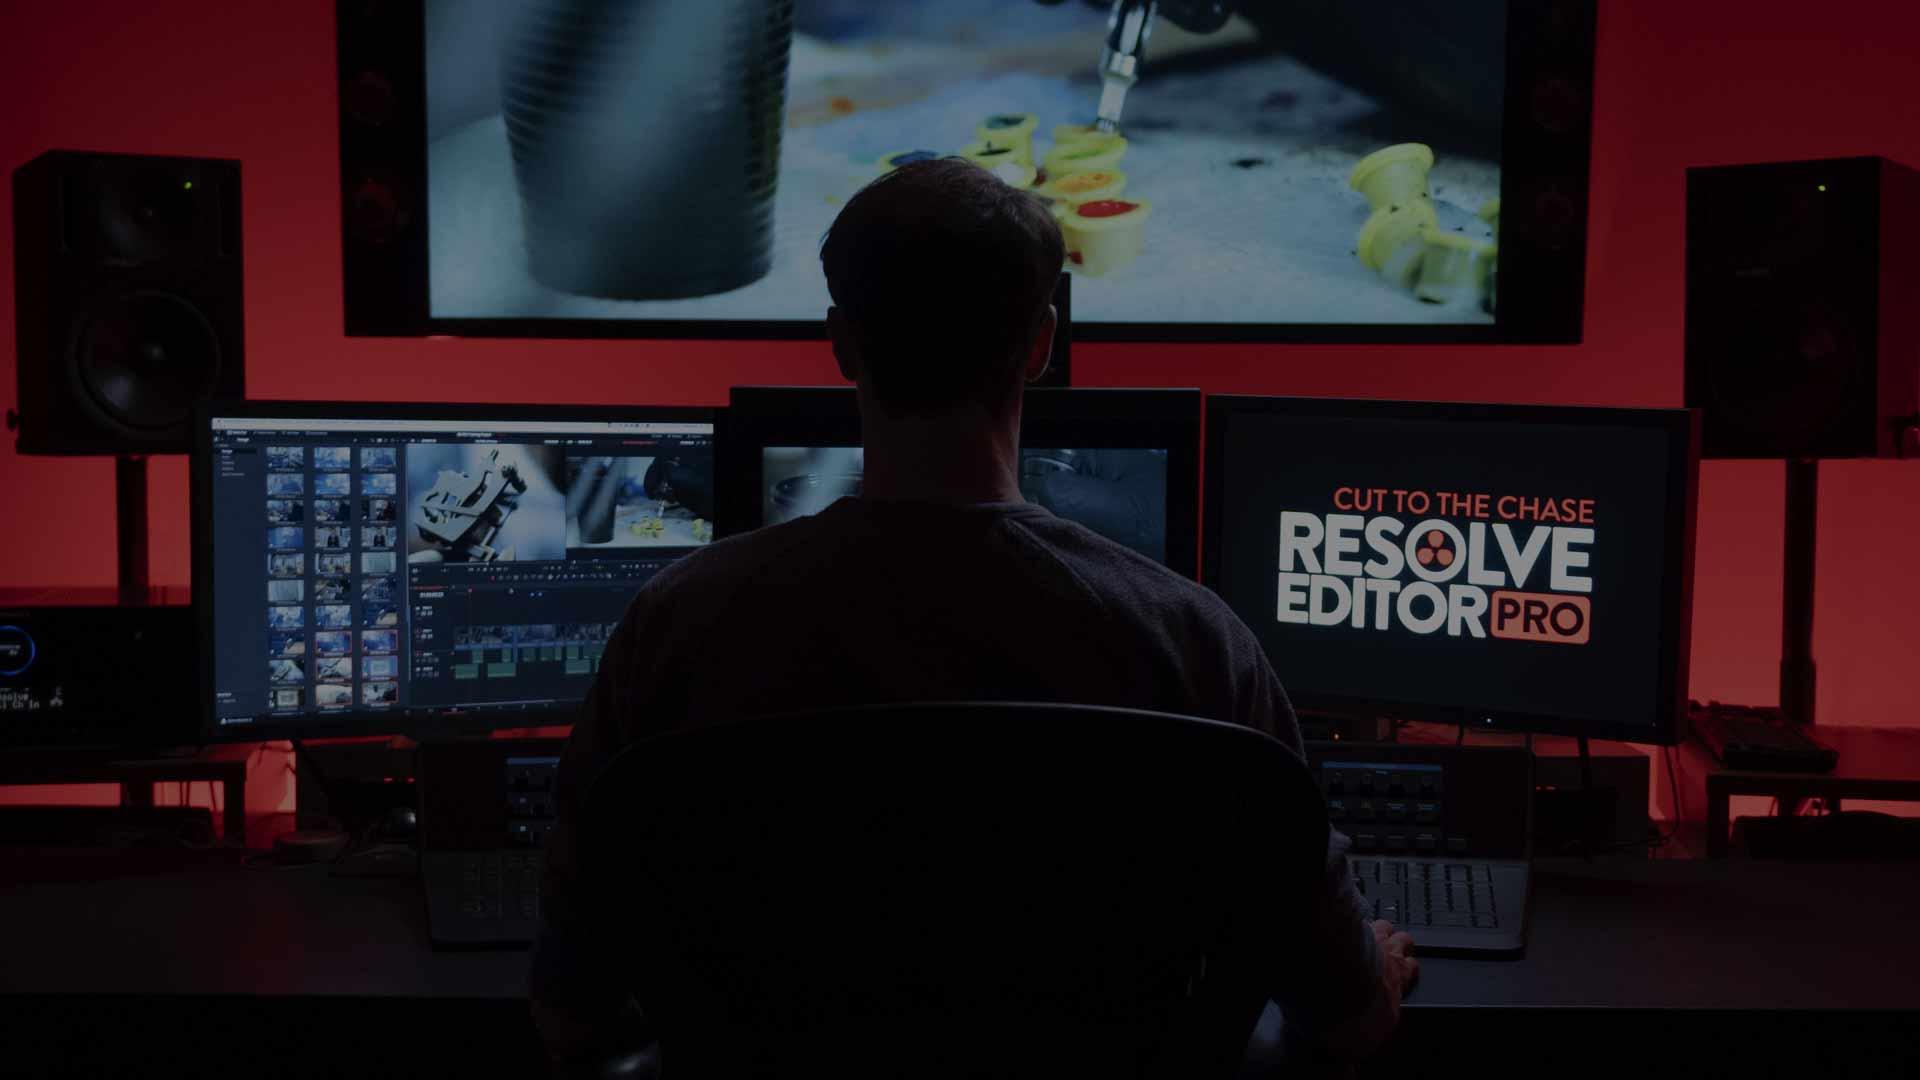 Resolve Editor Pro